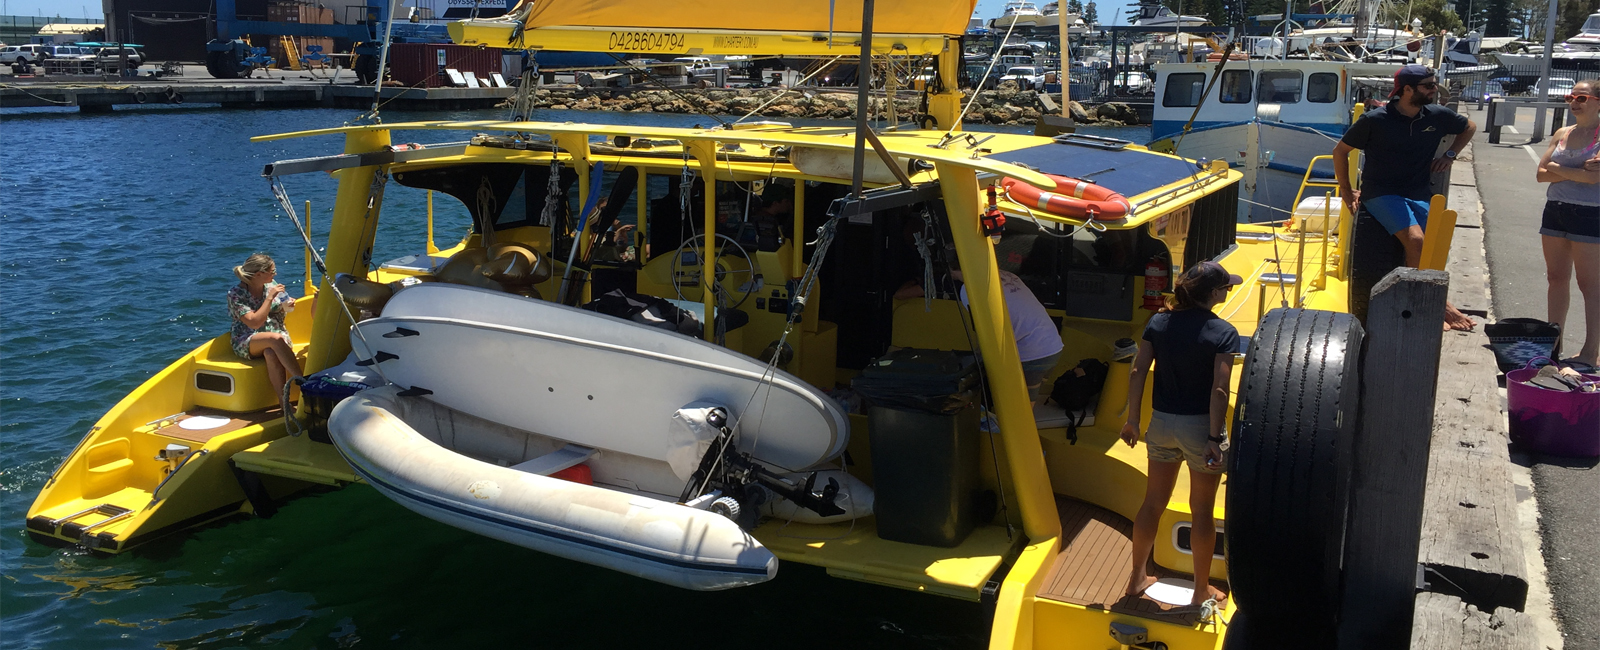 CAPELLA-departing-from-Fremantle-Rottnest-boat-charter-sailing